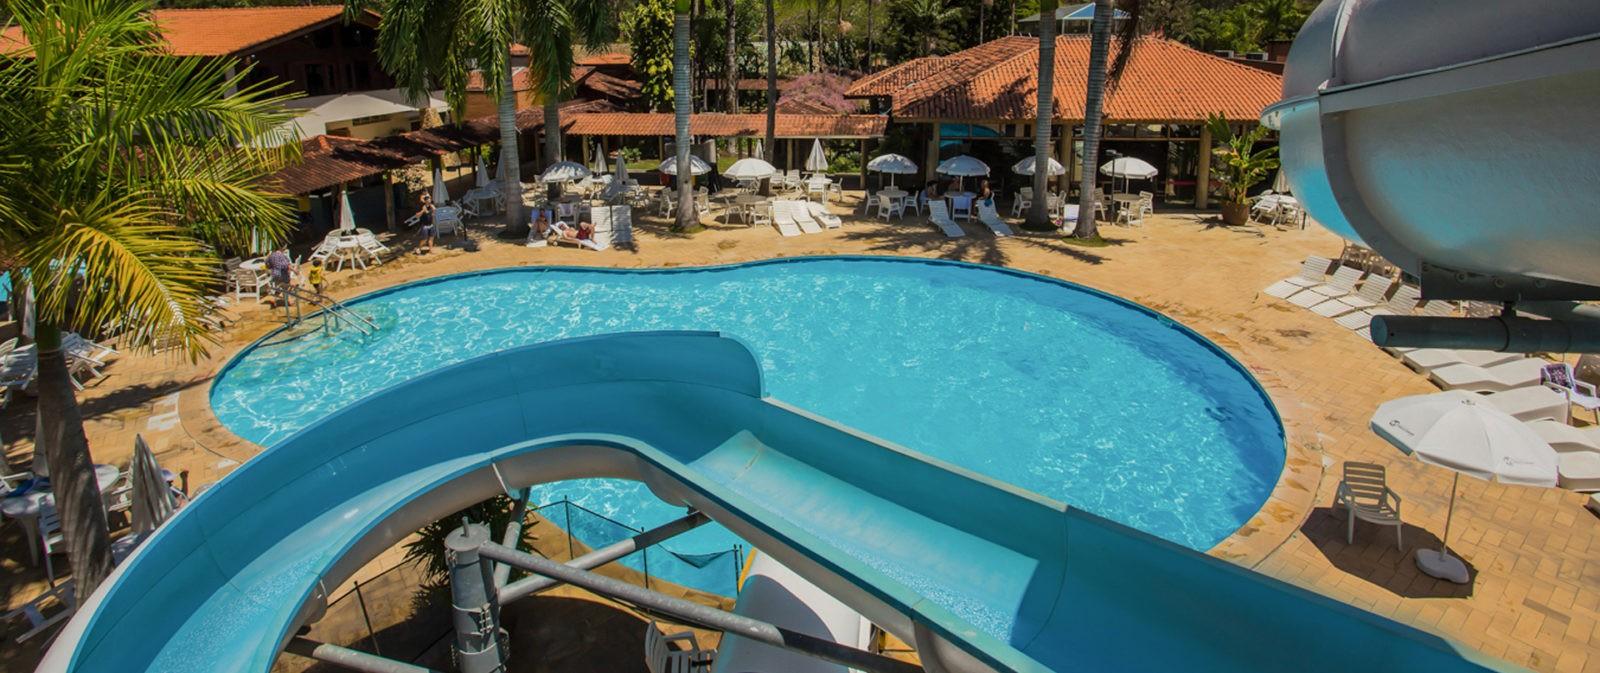 piscina hotel fazenda mazzaropi 08 - Janeiro 2019